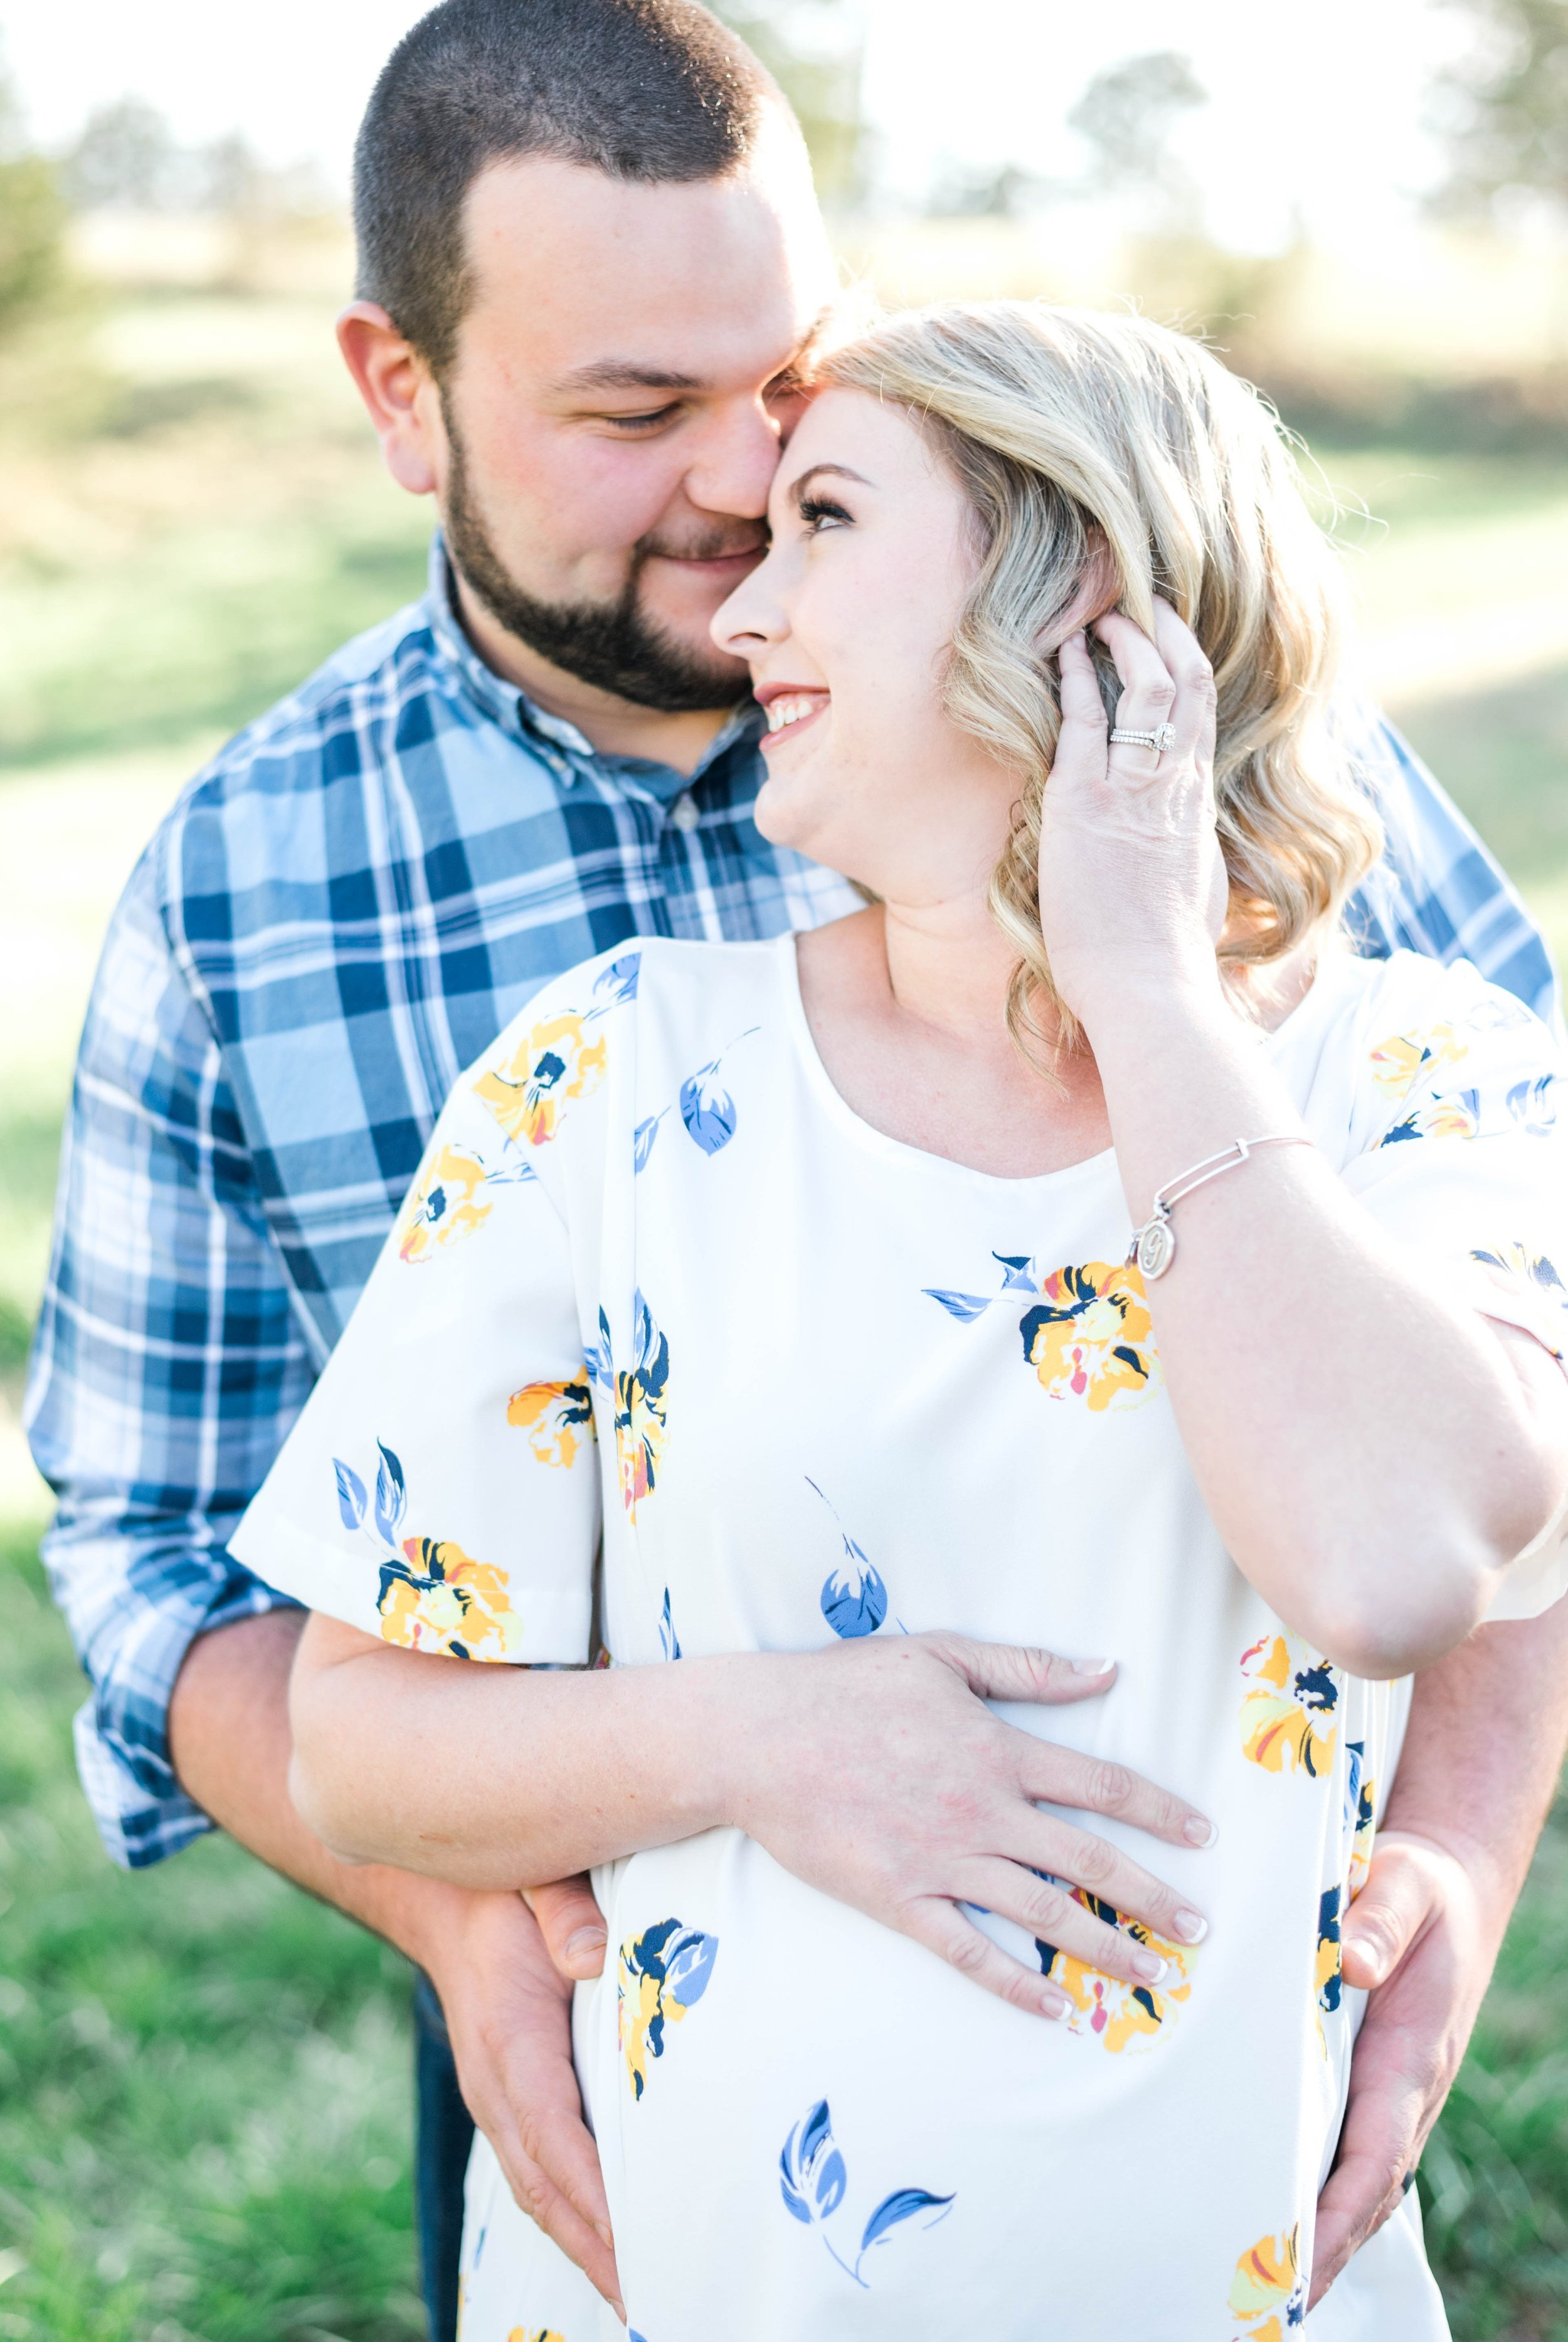 SorellaFarms_Jessica+Dylan_MaternitySession_Virginiaweddingphotographer 6.jpg